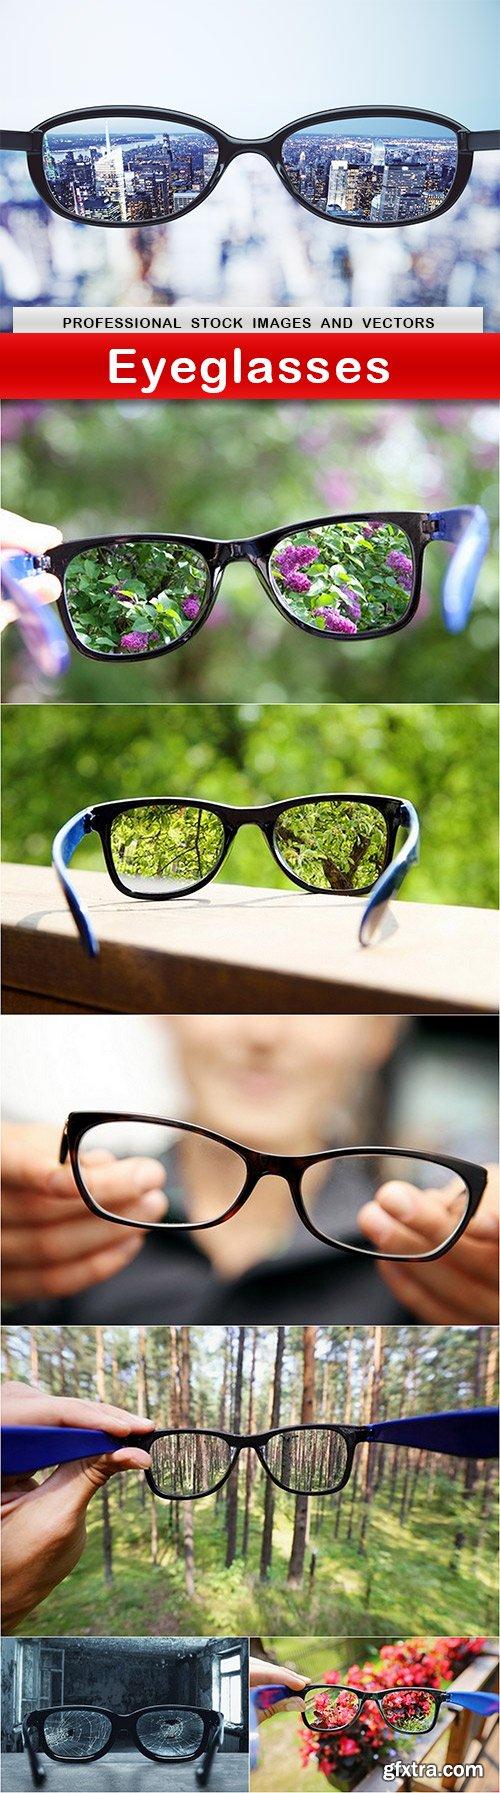 Eyeglasses - 7 UHQ JPEG